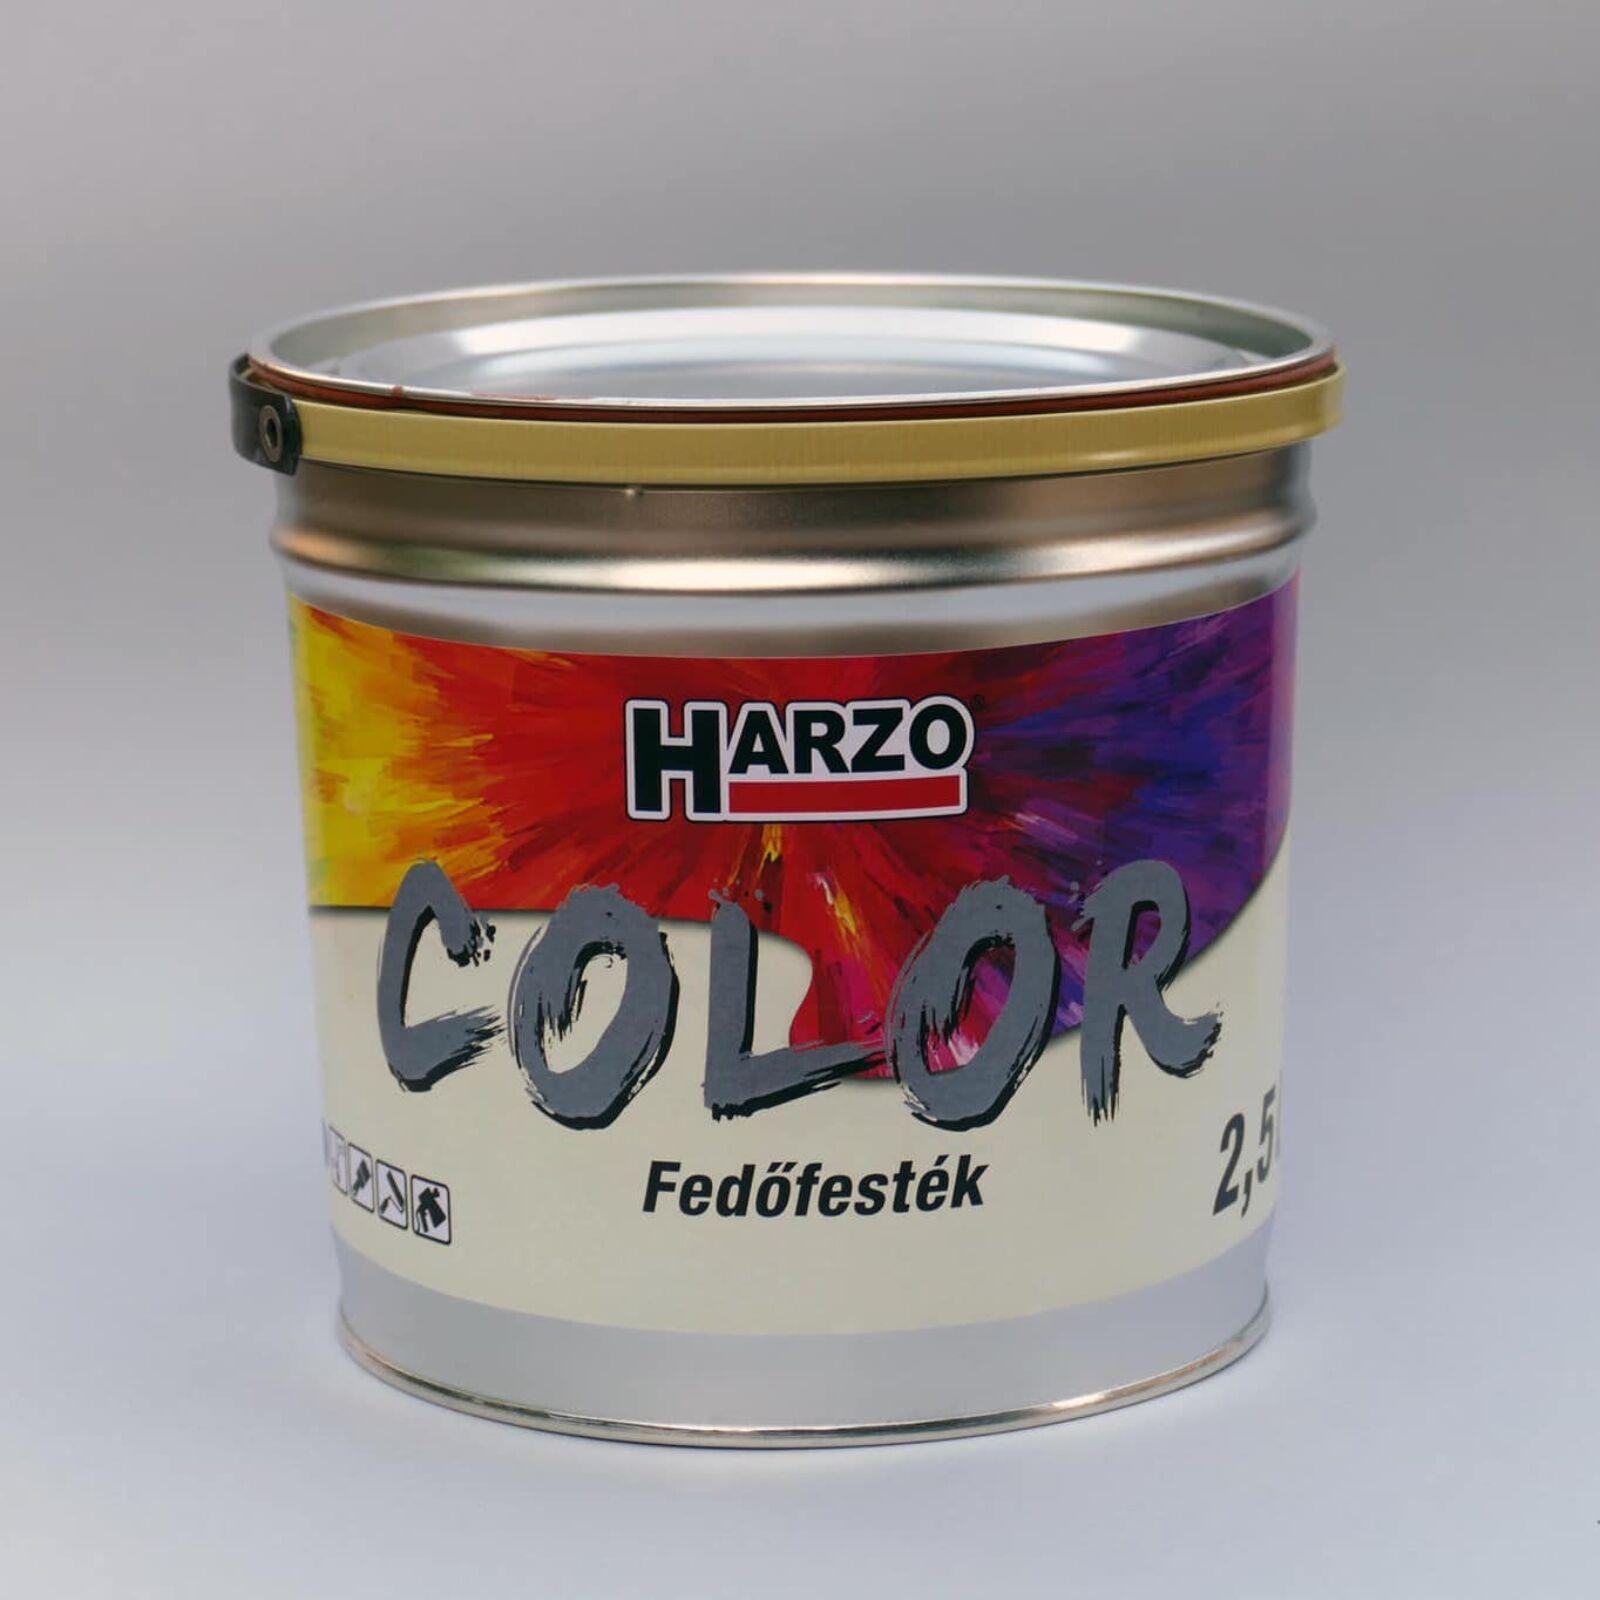 HARZO Color fedőfesték [14 lit]